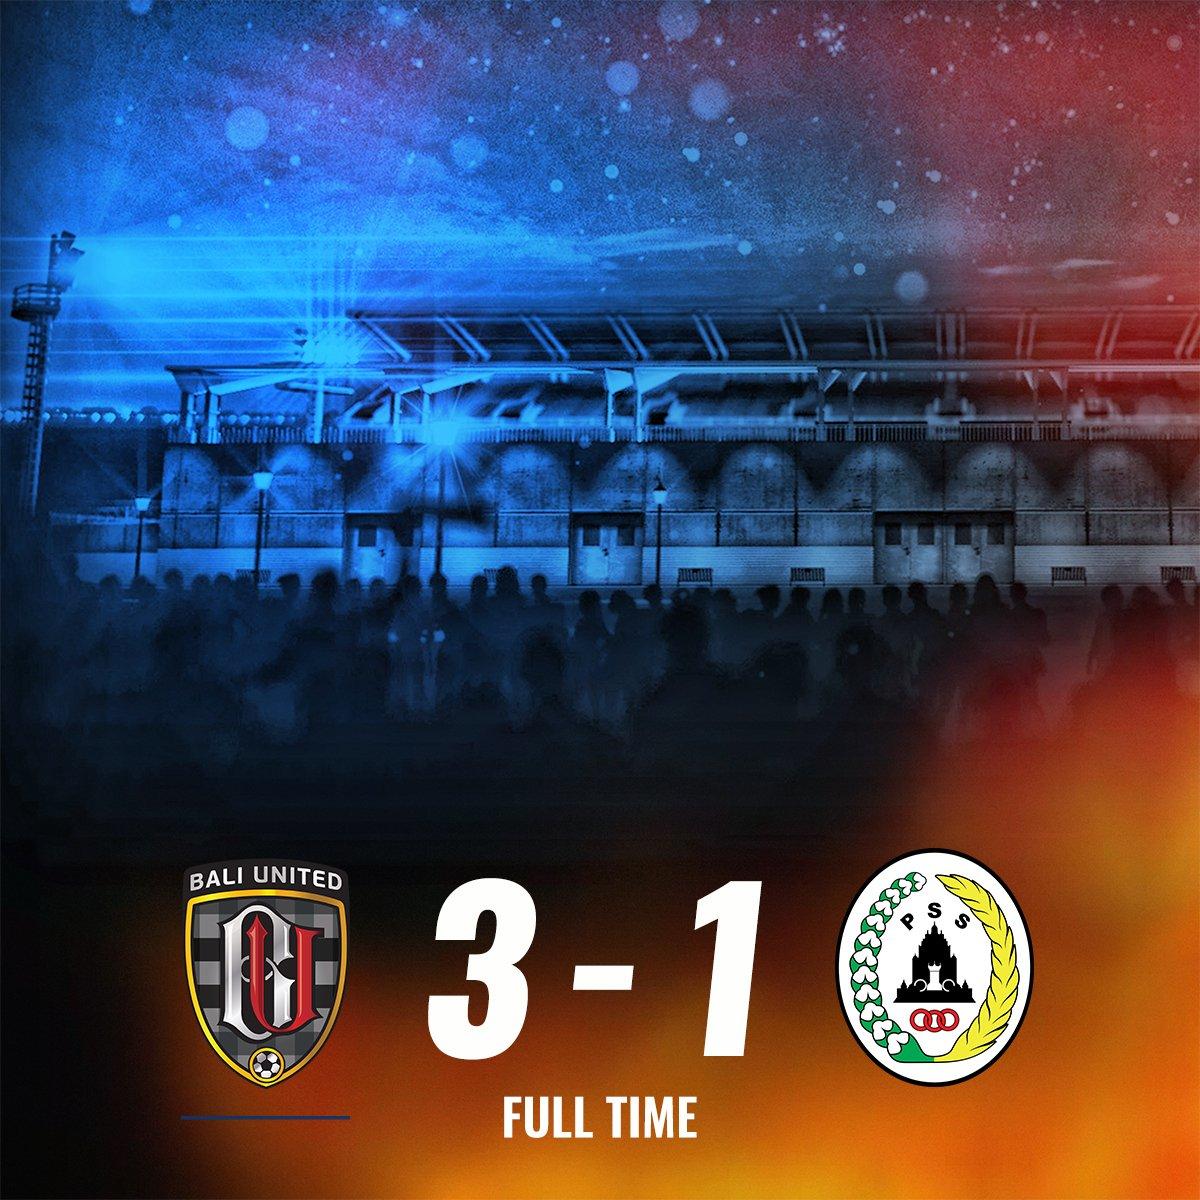 Hasil Pertandingan Bali United 3-1 PSS Sleman